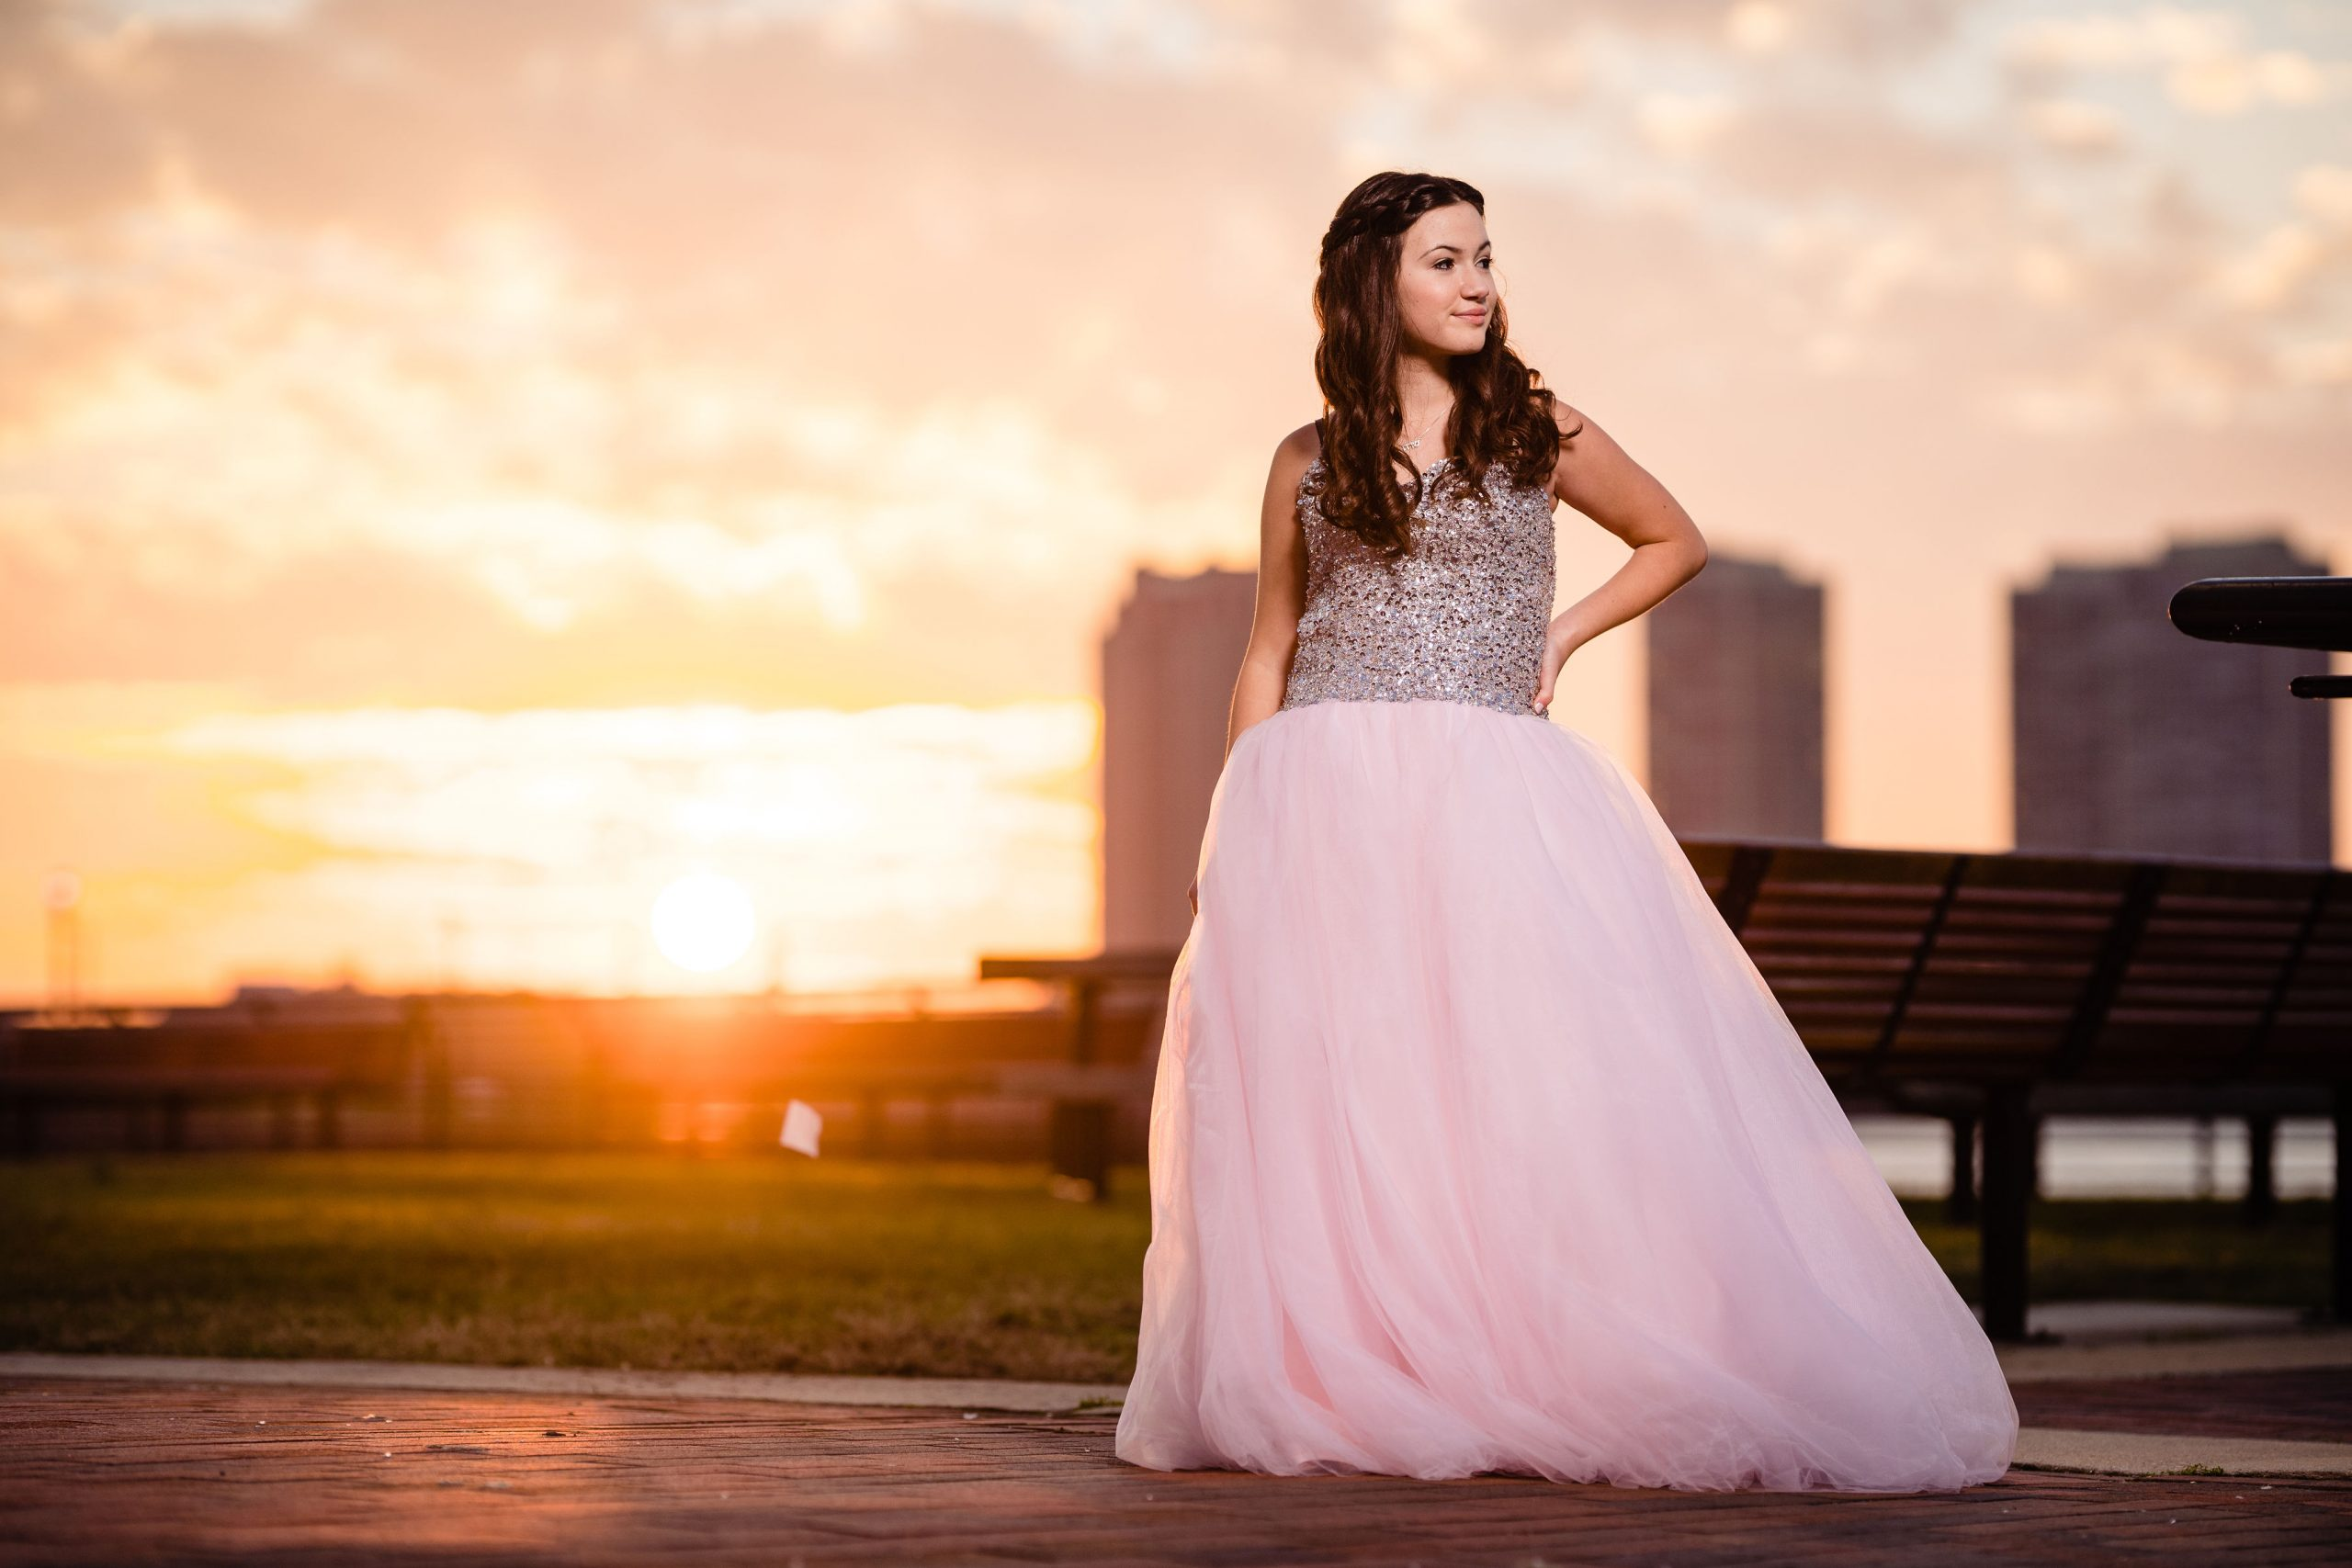 Stunning girl.in pink dress